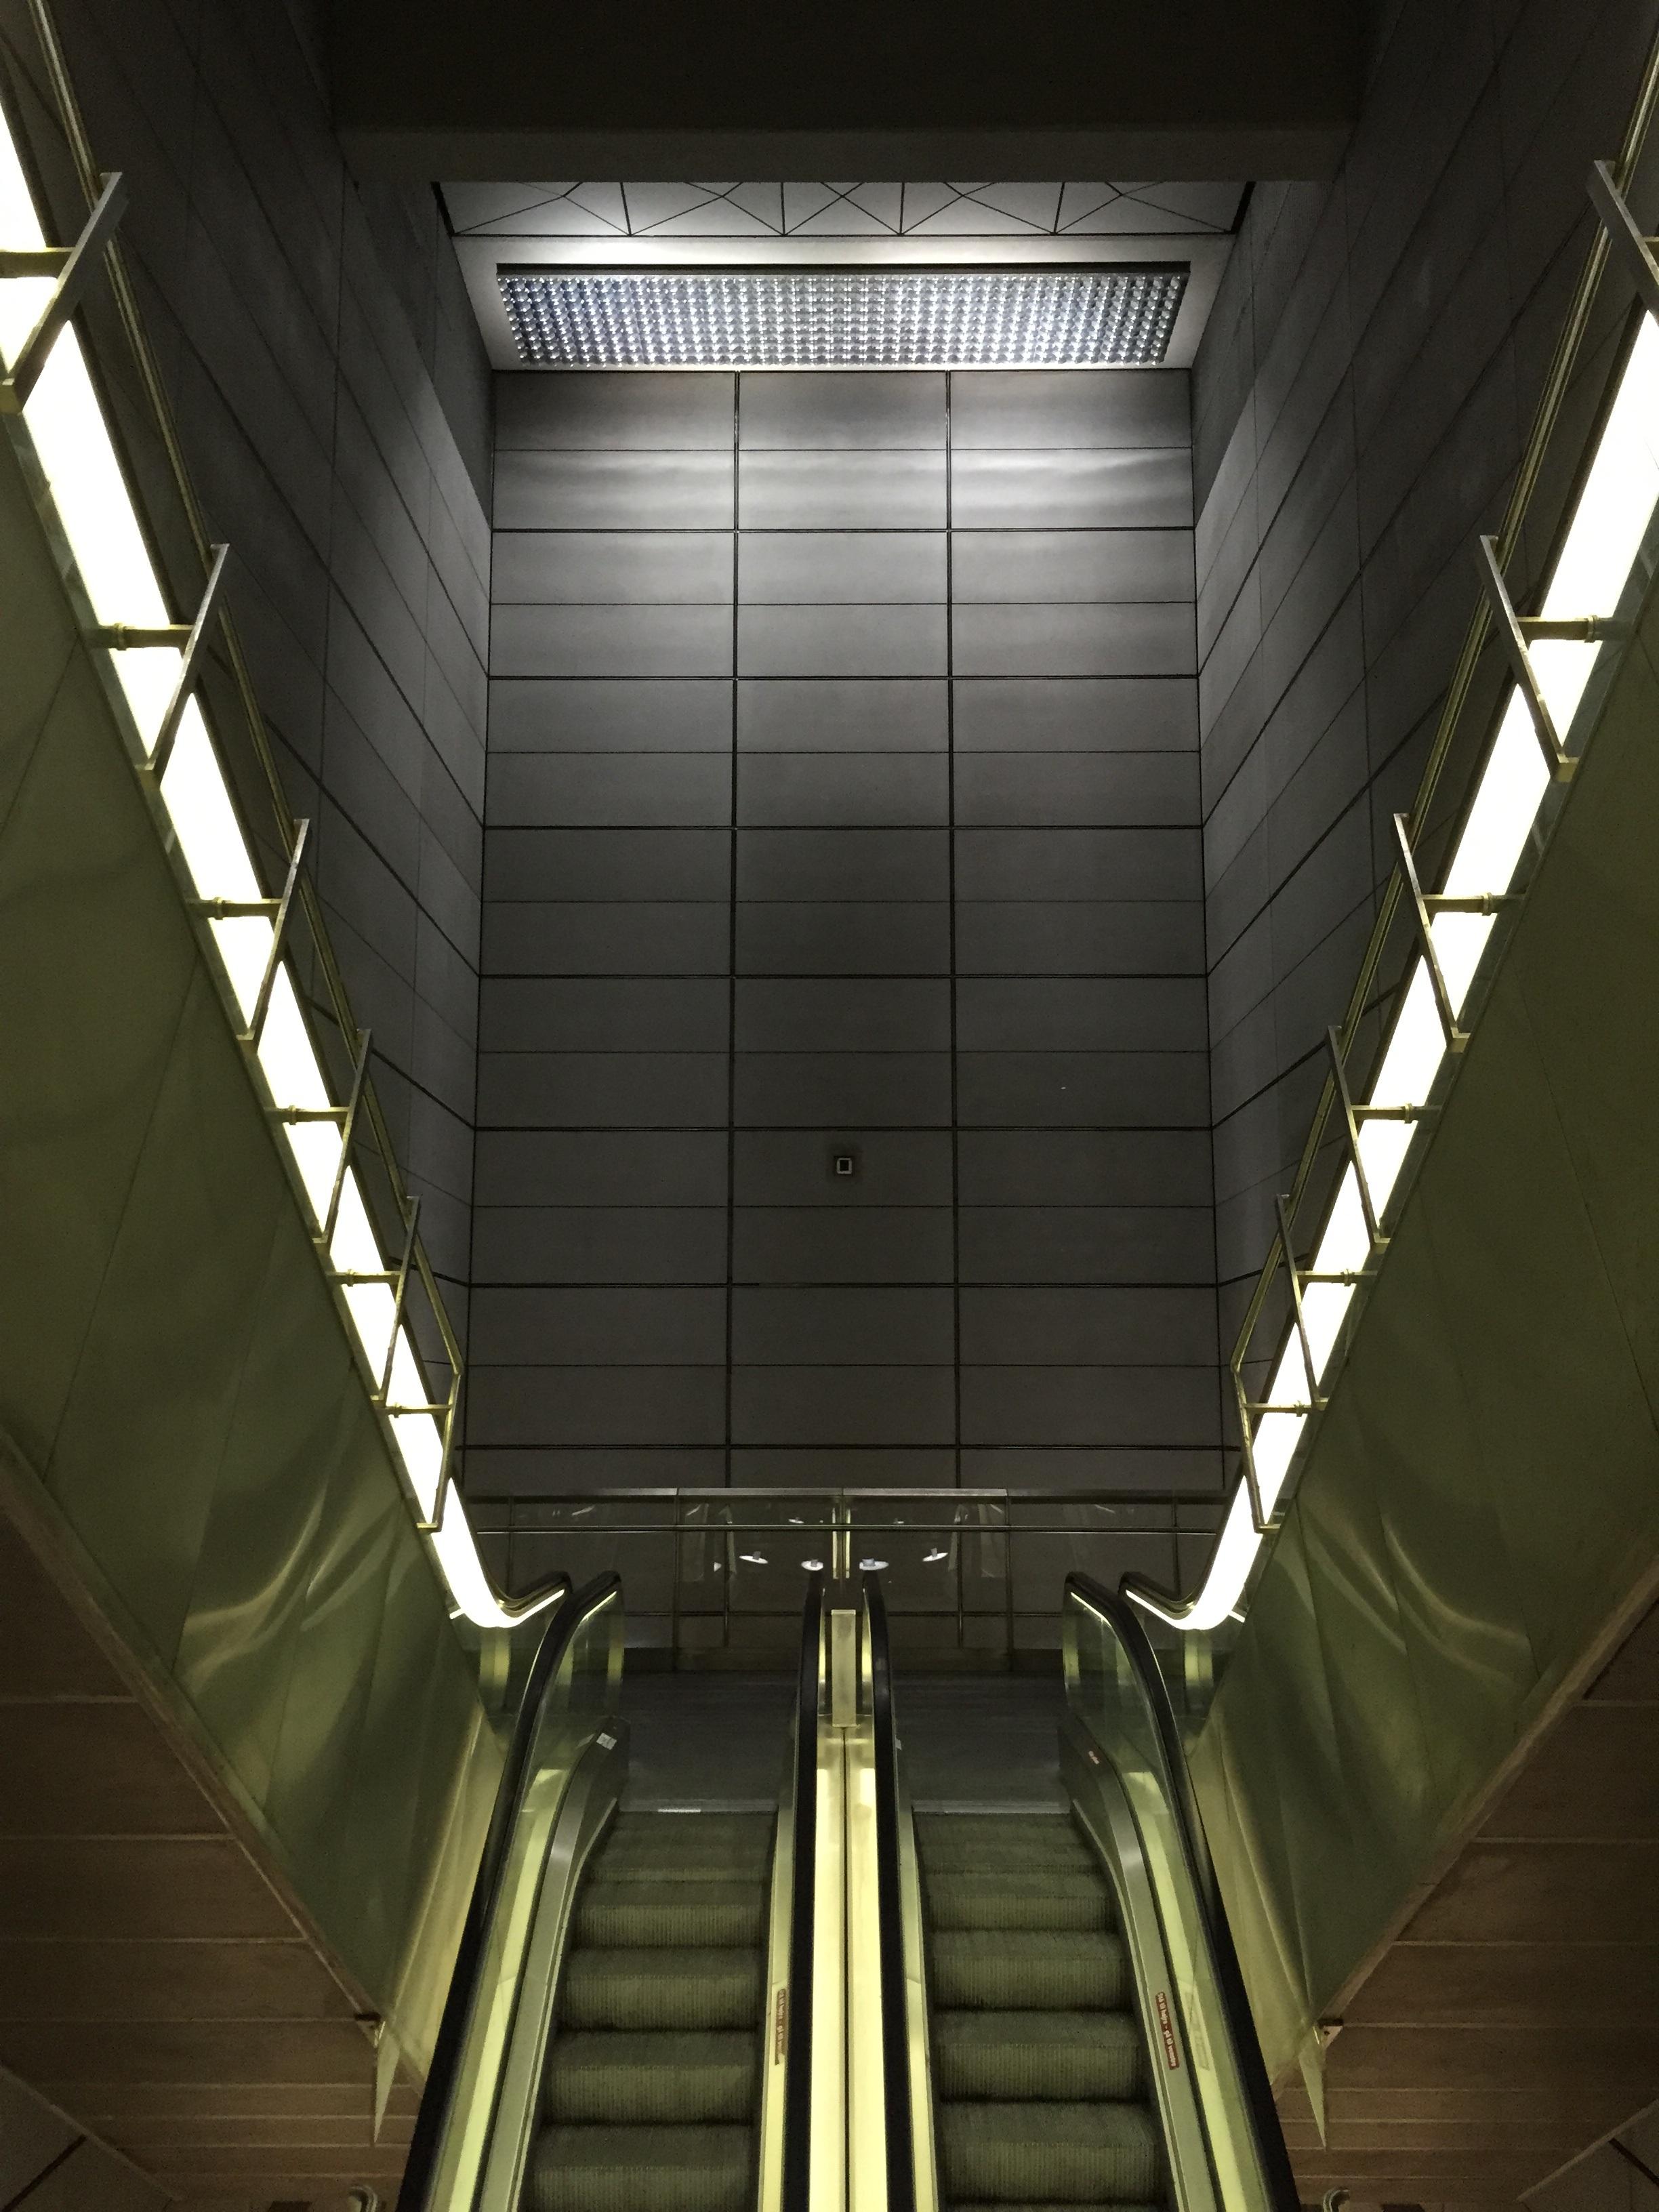 Light Architecture Atmosphere Staircase Escalator Subway Metro Hall Metal  Darkness Lighting Public Transport Interior Design Stairs